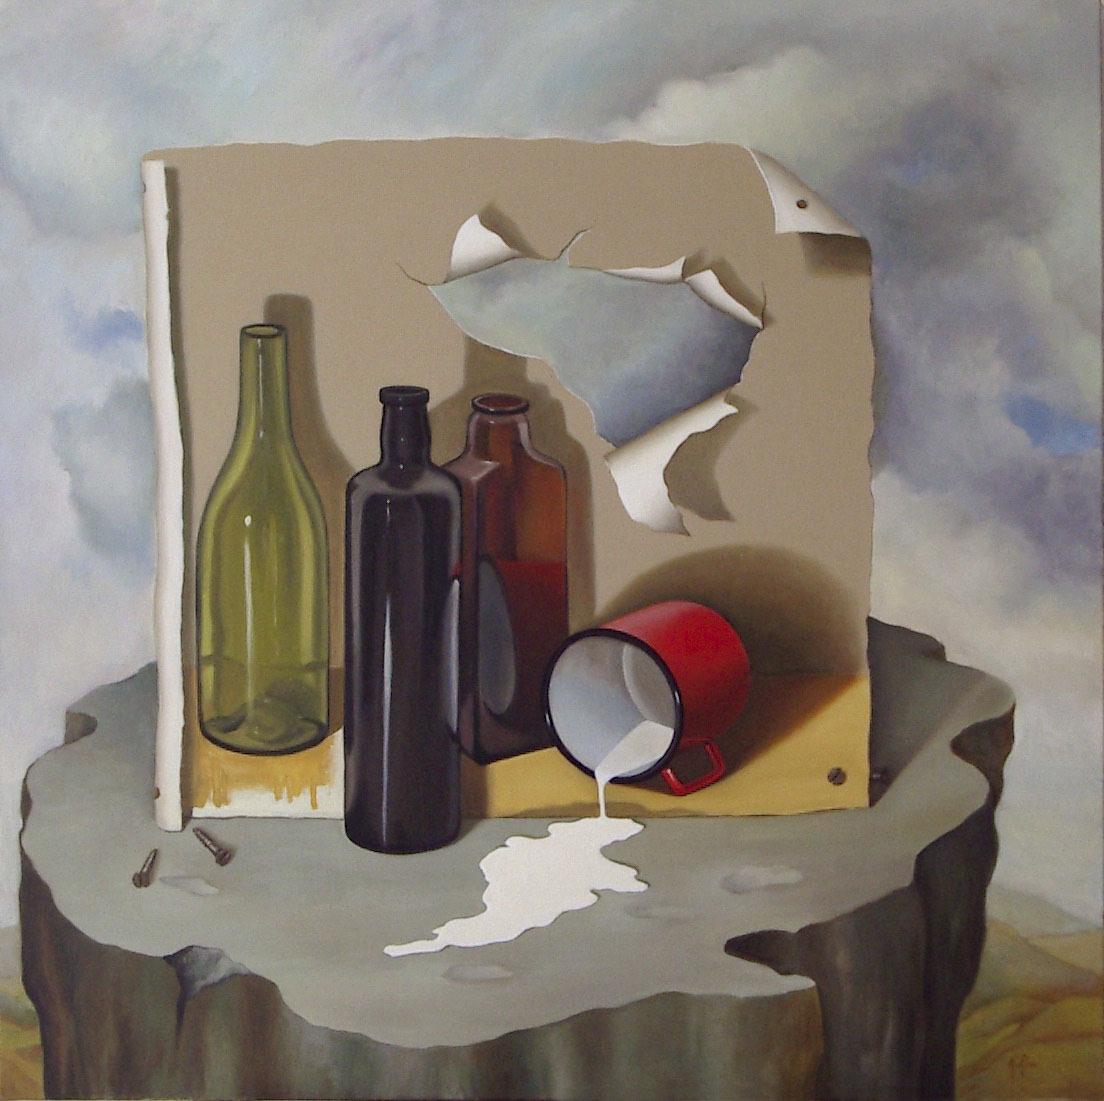 2005 roberta rossi - Il latte versato - olio su tela - 70 x 70